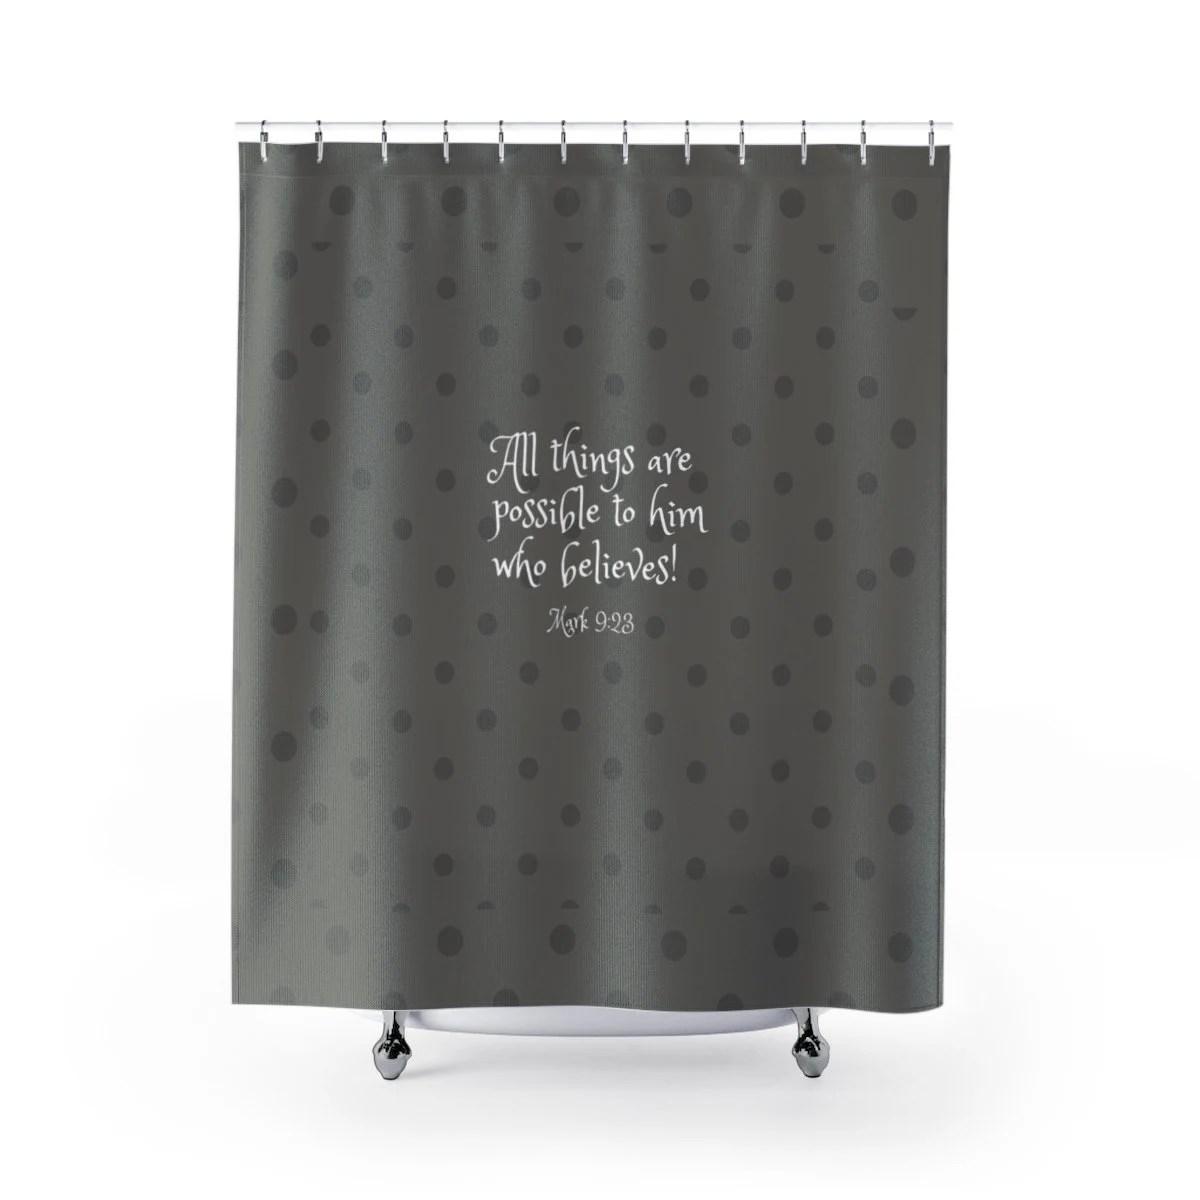 bible verse shower curtain christian shower curtain inspirational bath set scripture shower curtain religious bath set